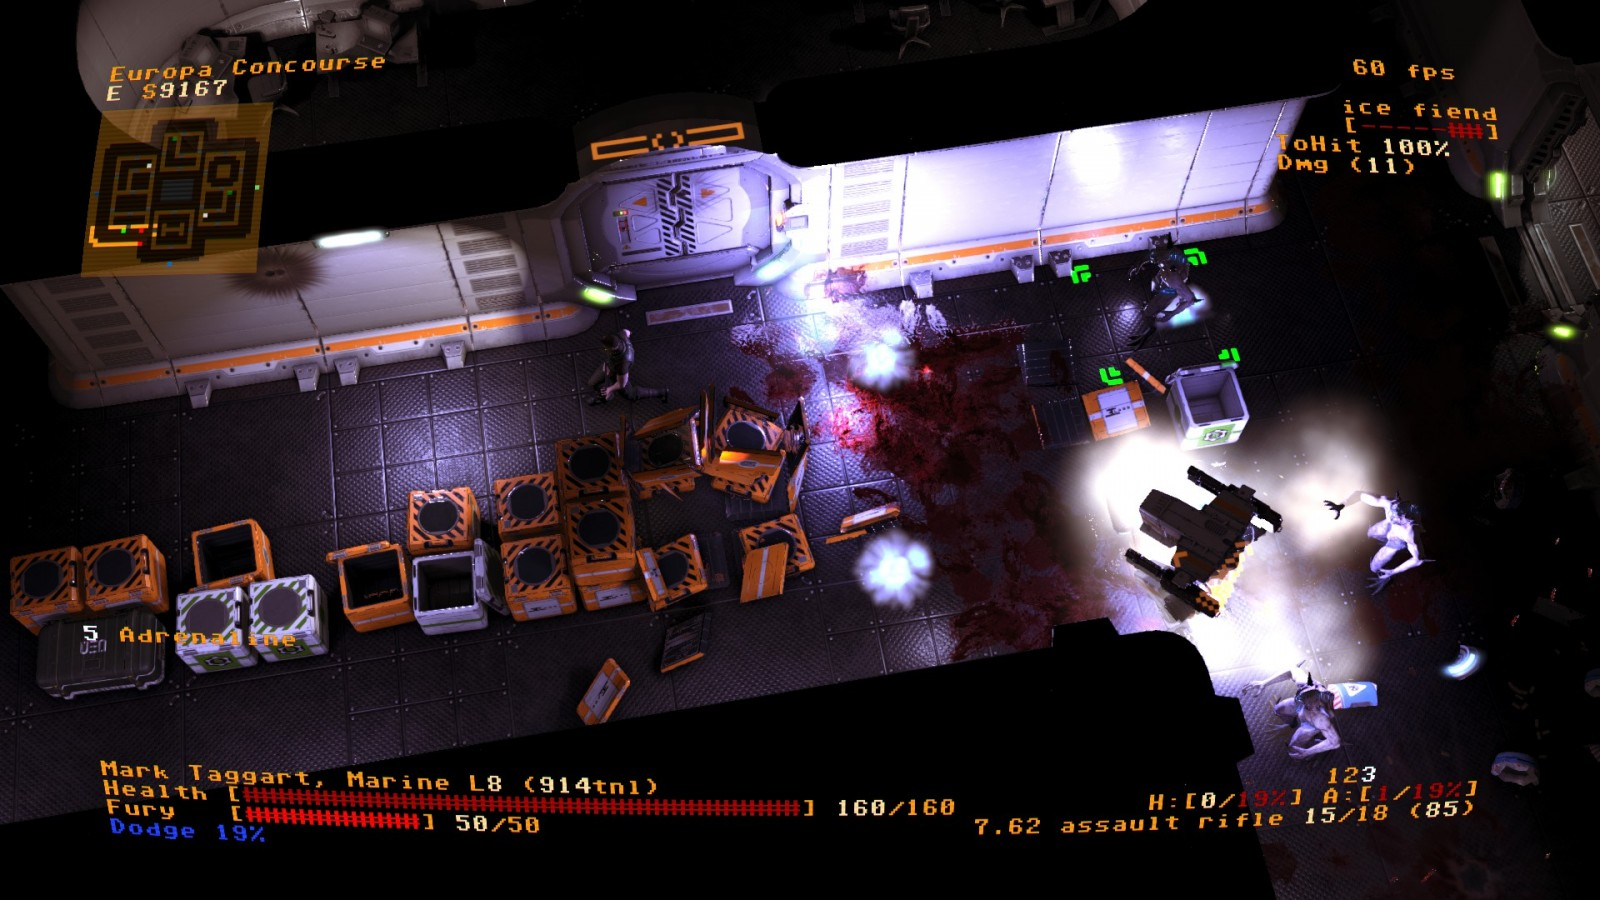 Jupiter Hell: EL RPG Sucesor de DOOM llegará en Agosto 3